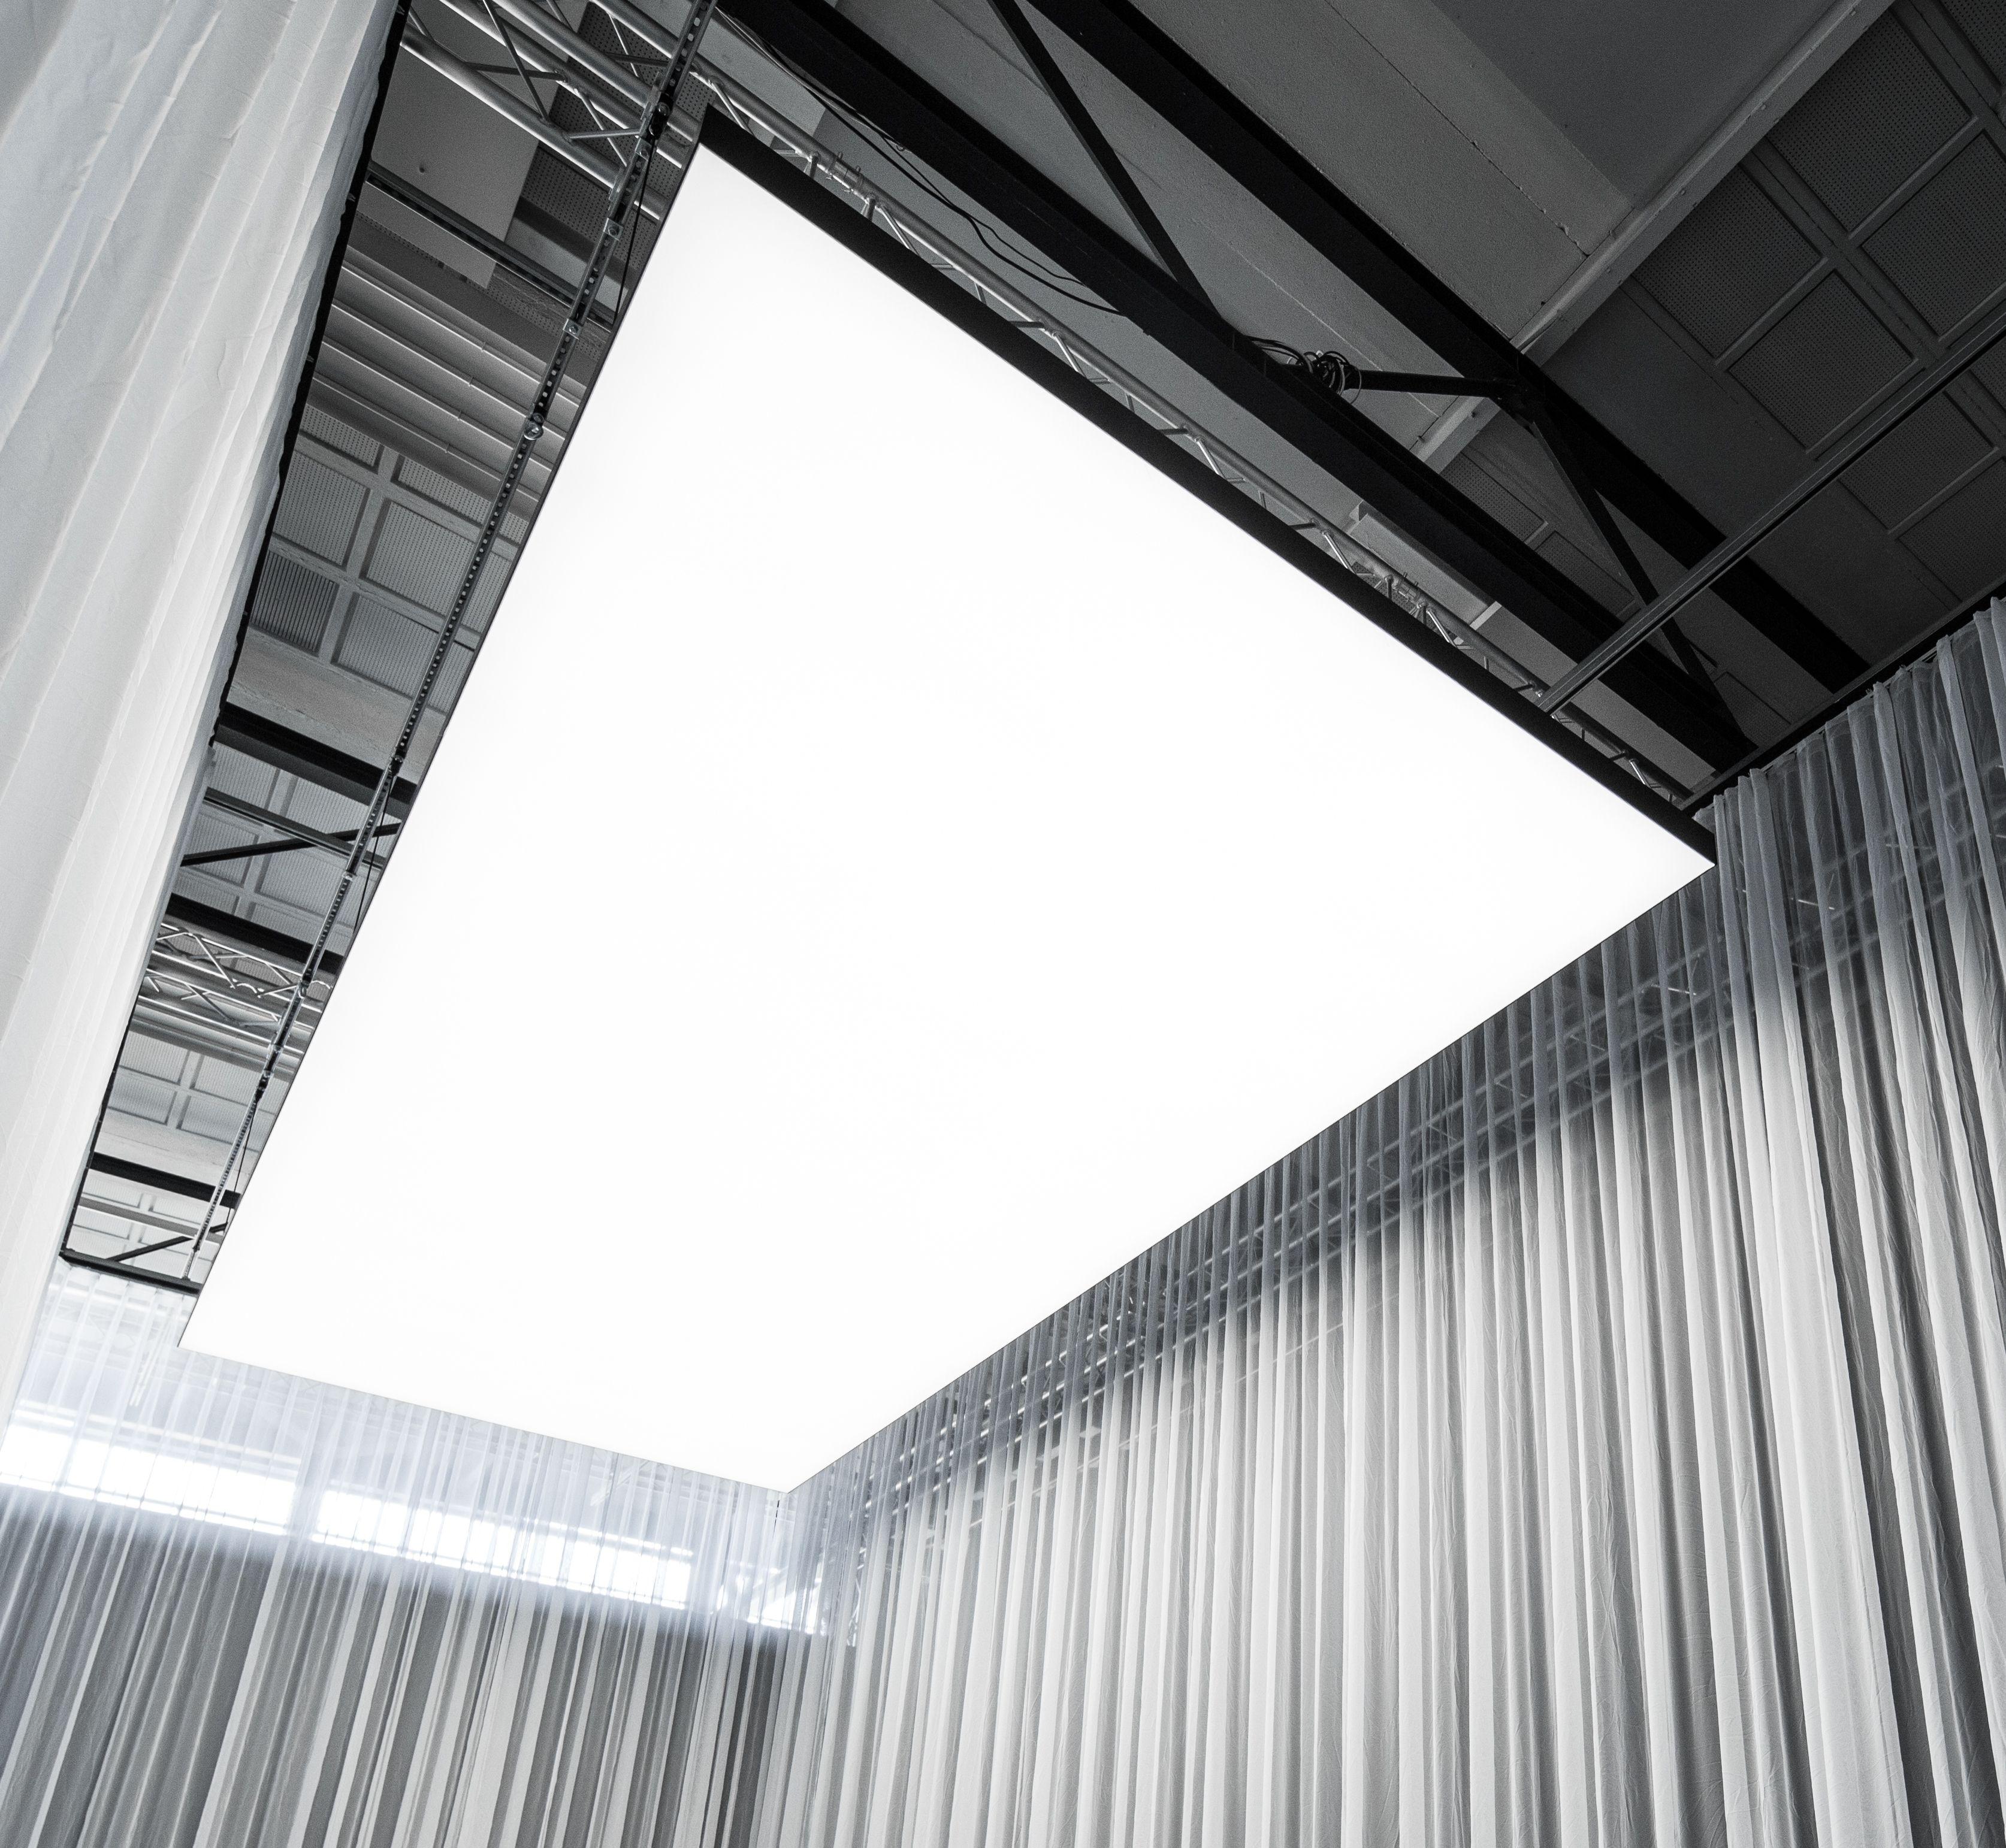 Philips led ceiling tiles httpcreativechairsandtables philips led ceiling tiles dailygadgetfo Images